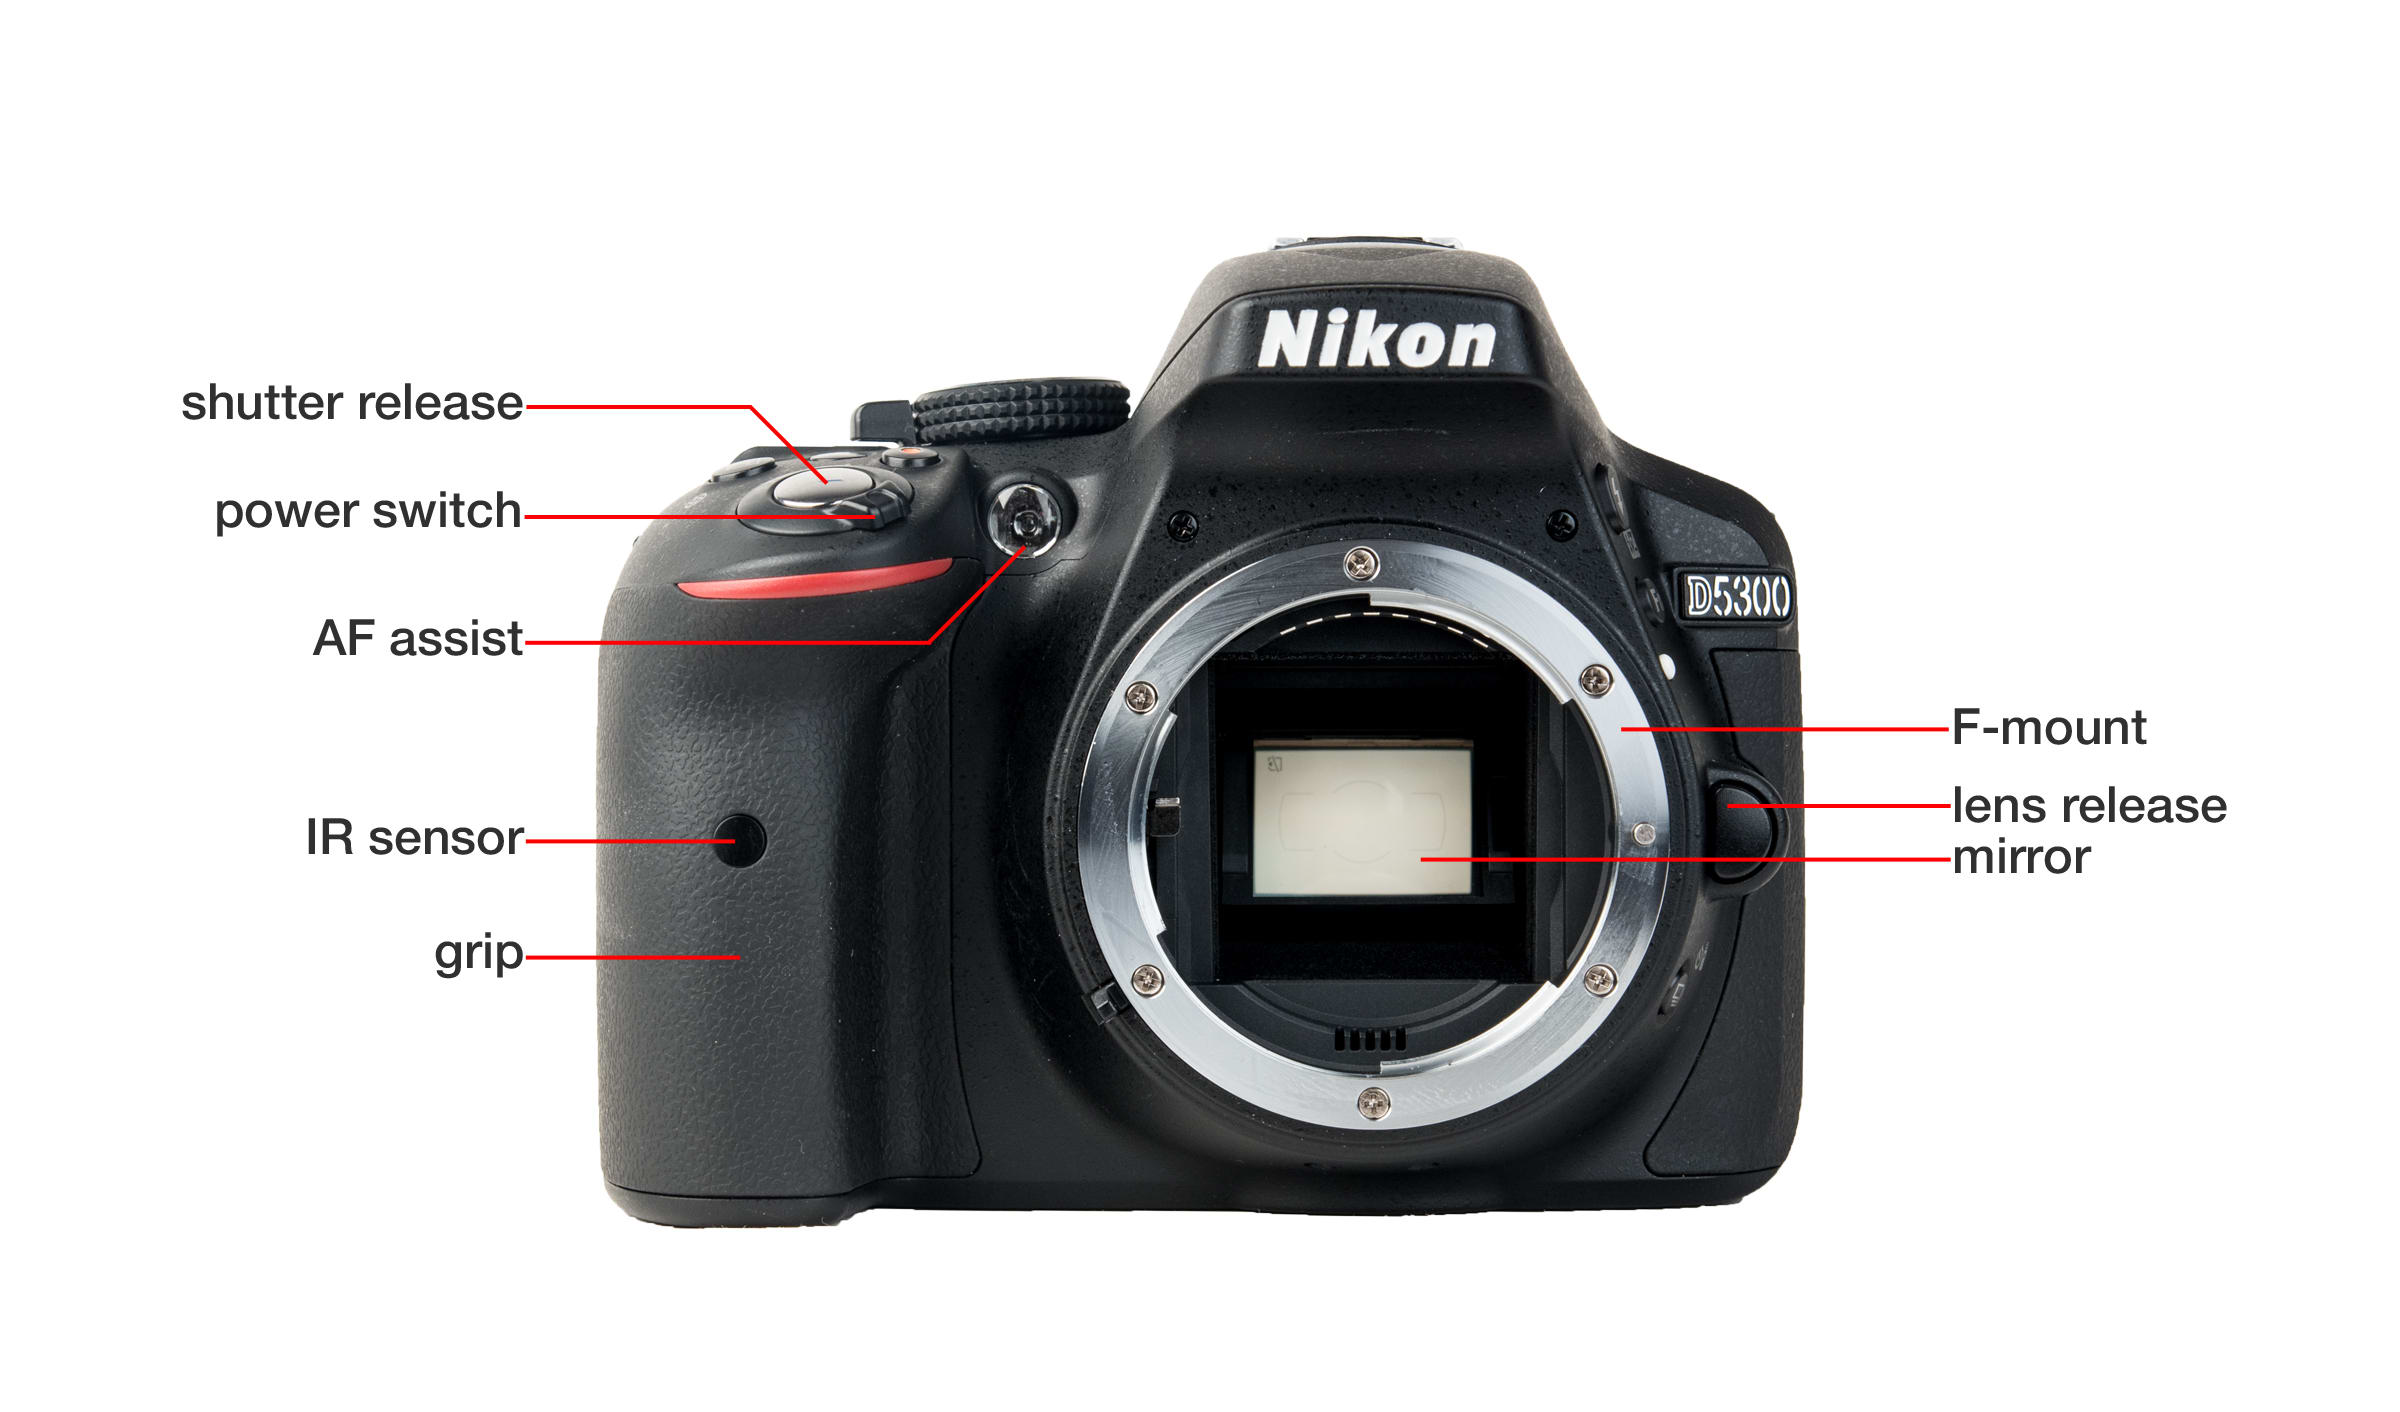 Front of Nikon D5300